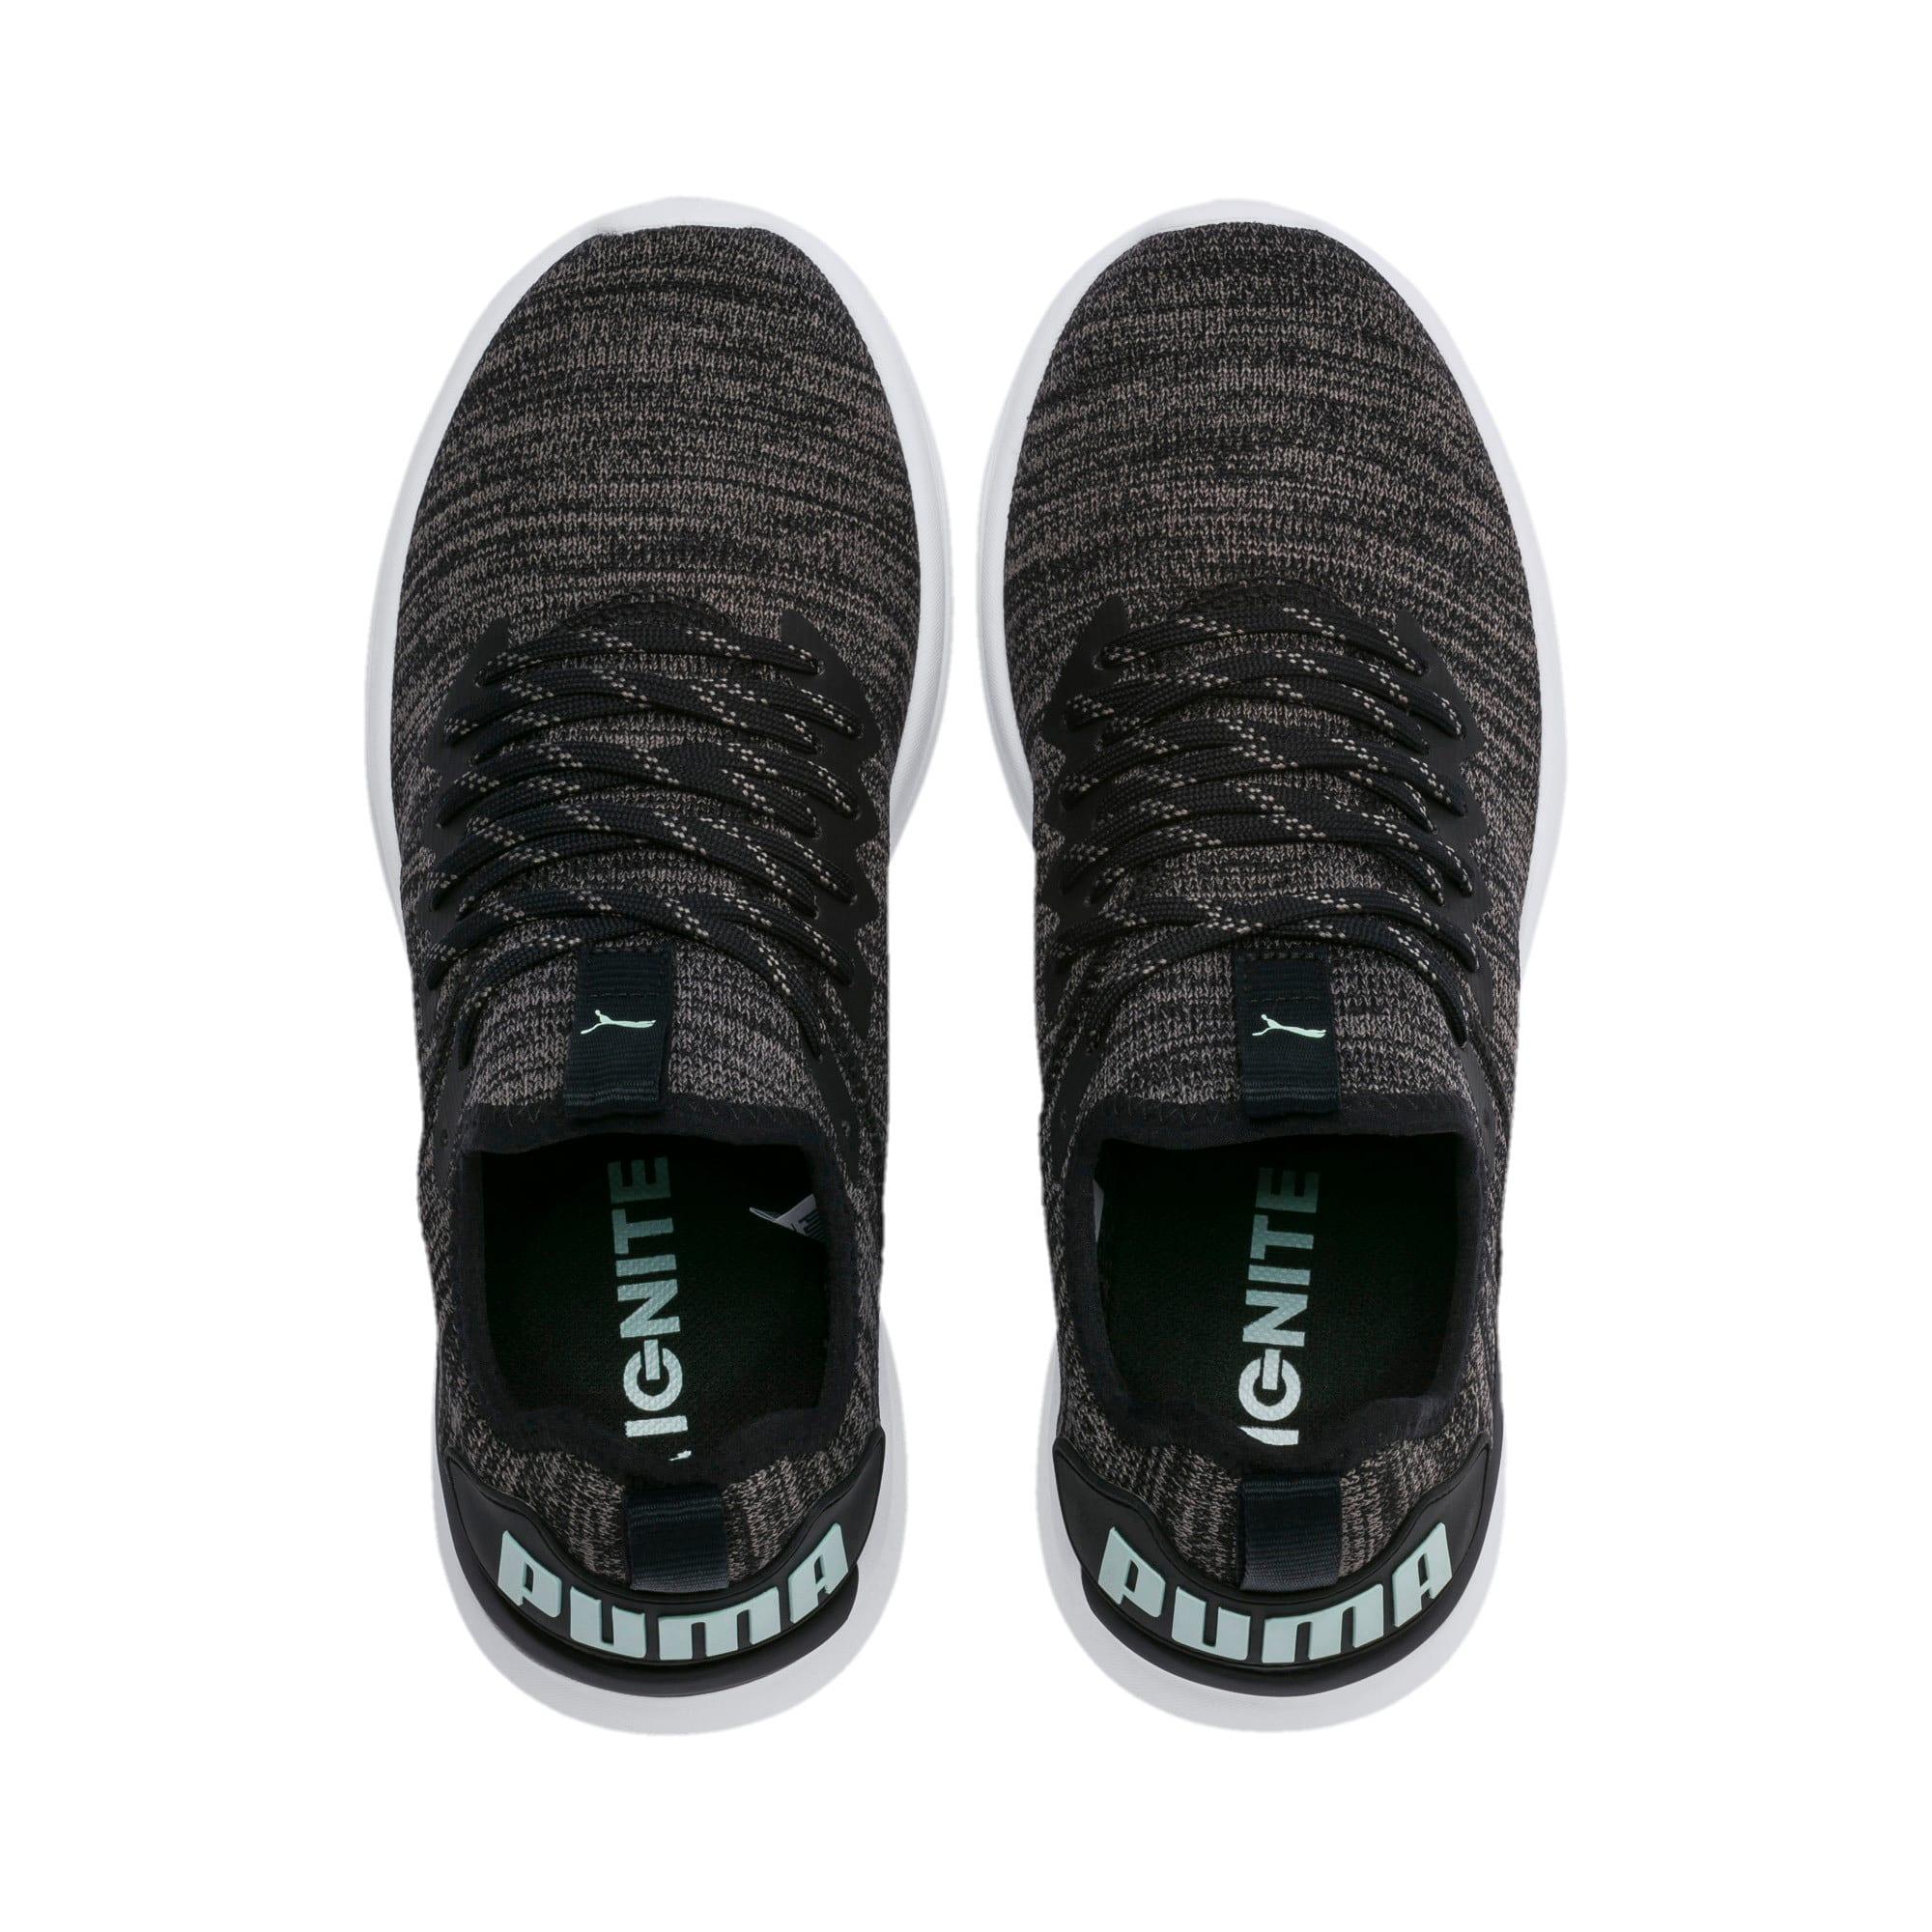 Thumbnail 7 of IGNITE Flash evoKNIT Women's Running Shoes, Black-Charcoal-Fair Aqua, medium